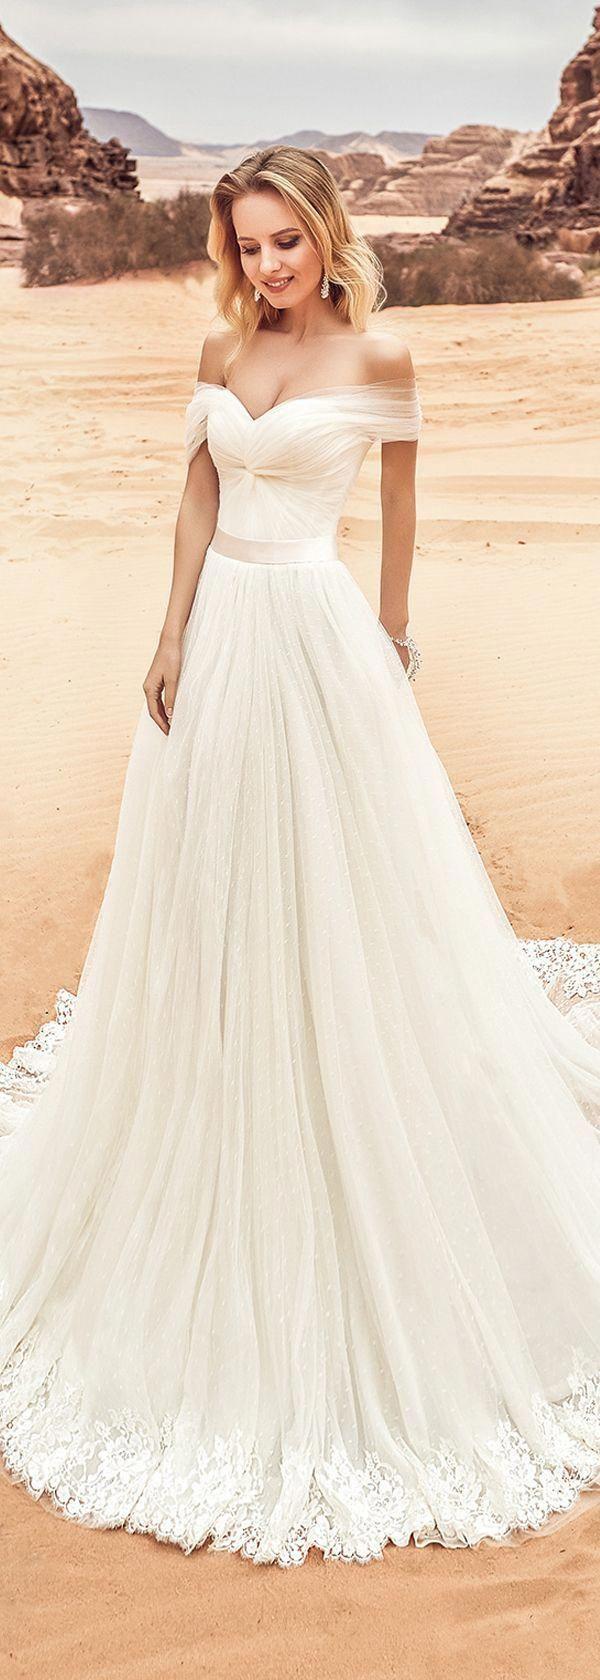 Fantastic Tulle Offtheshoulder Neckline Aline Wedding Dress With Lace Appliques Beautifulbeddings: Linen Line Wedding Dress At Websimilar.org